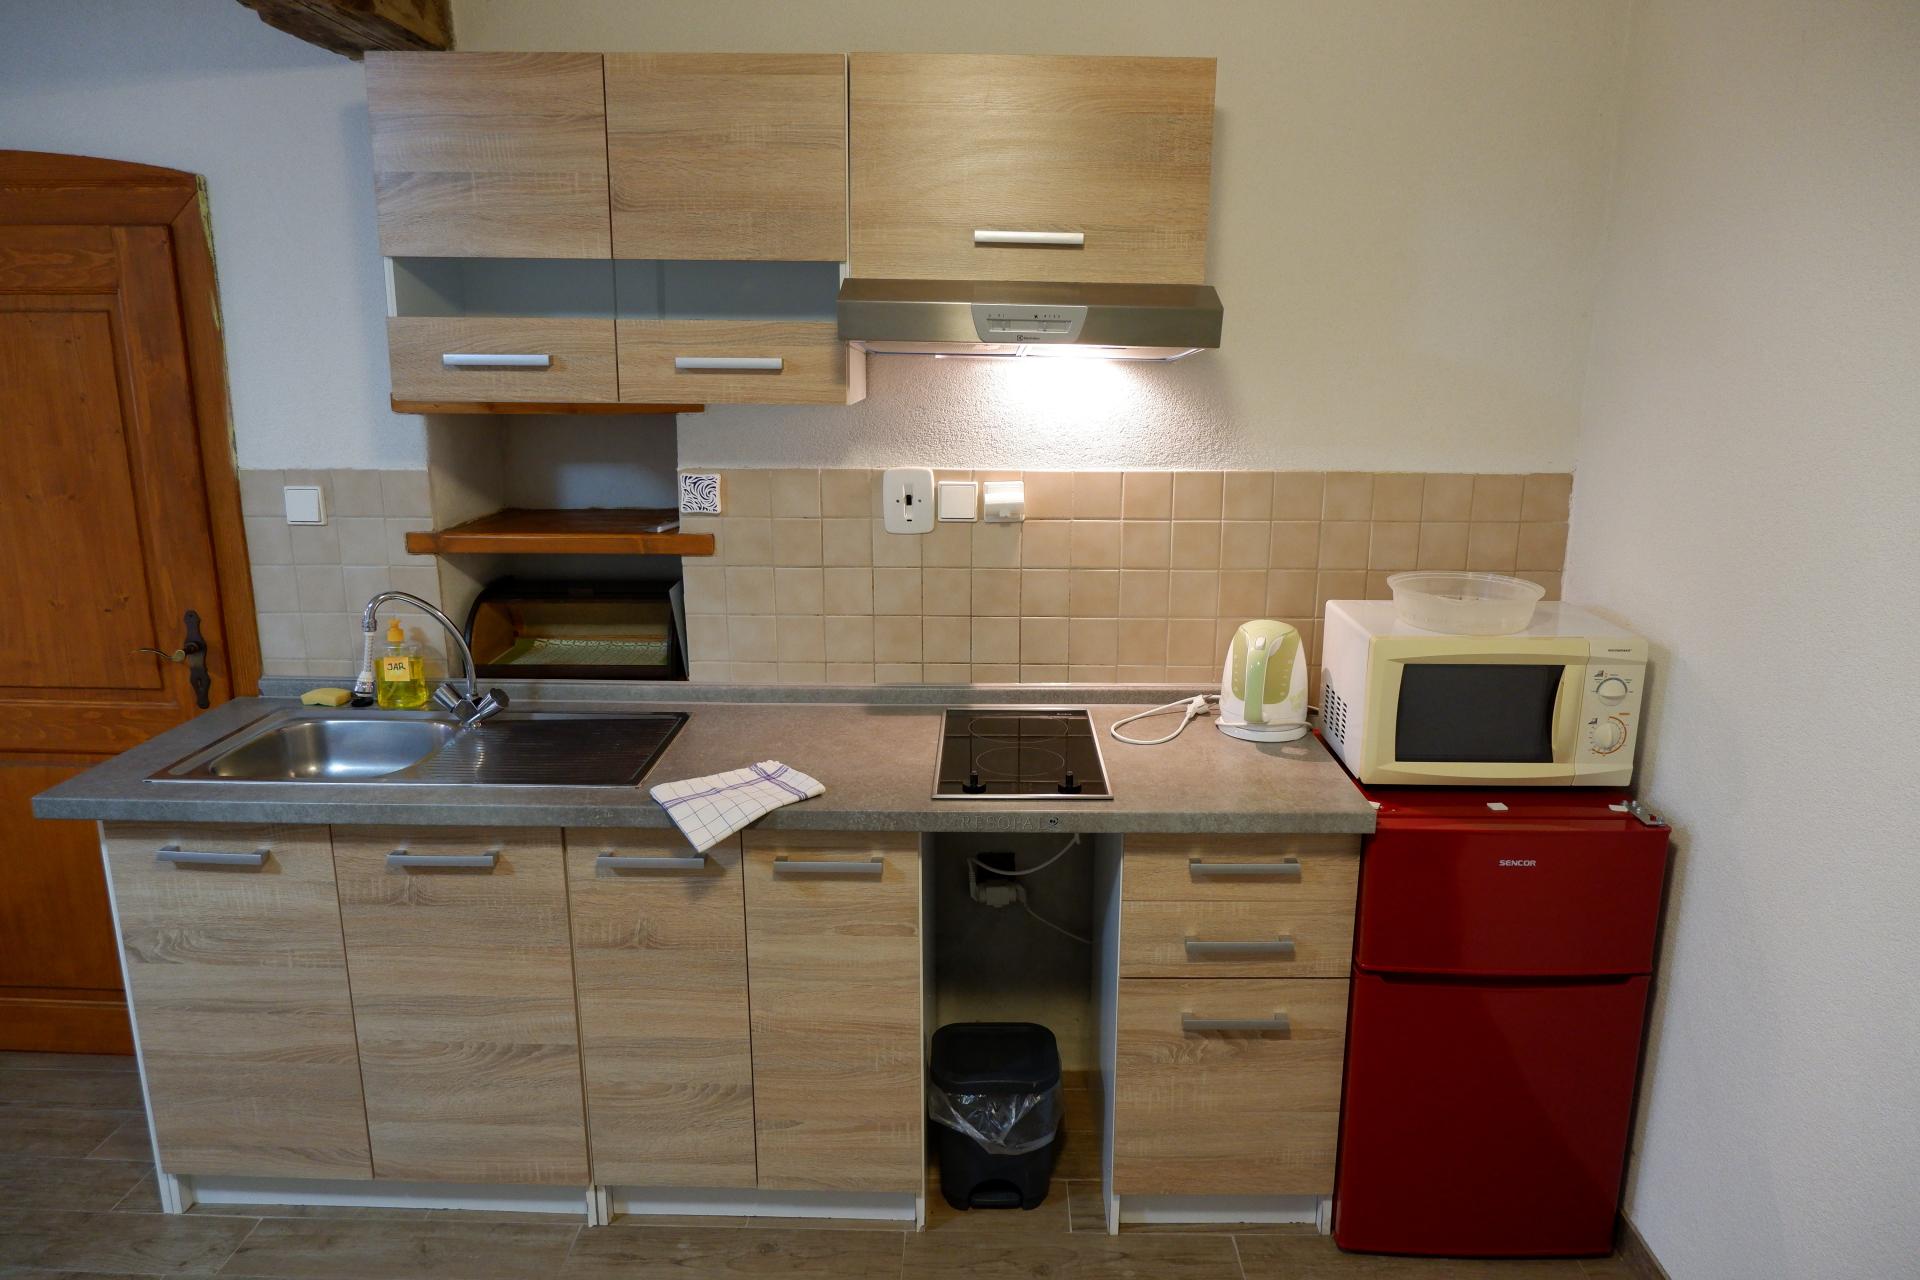 Apartmán 3. kuchyně